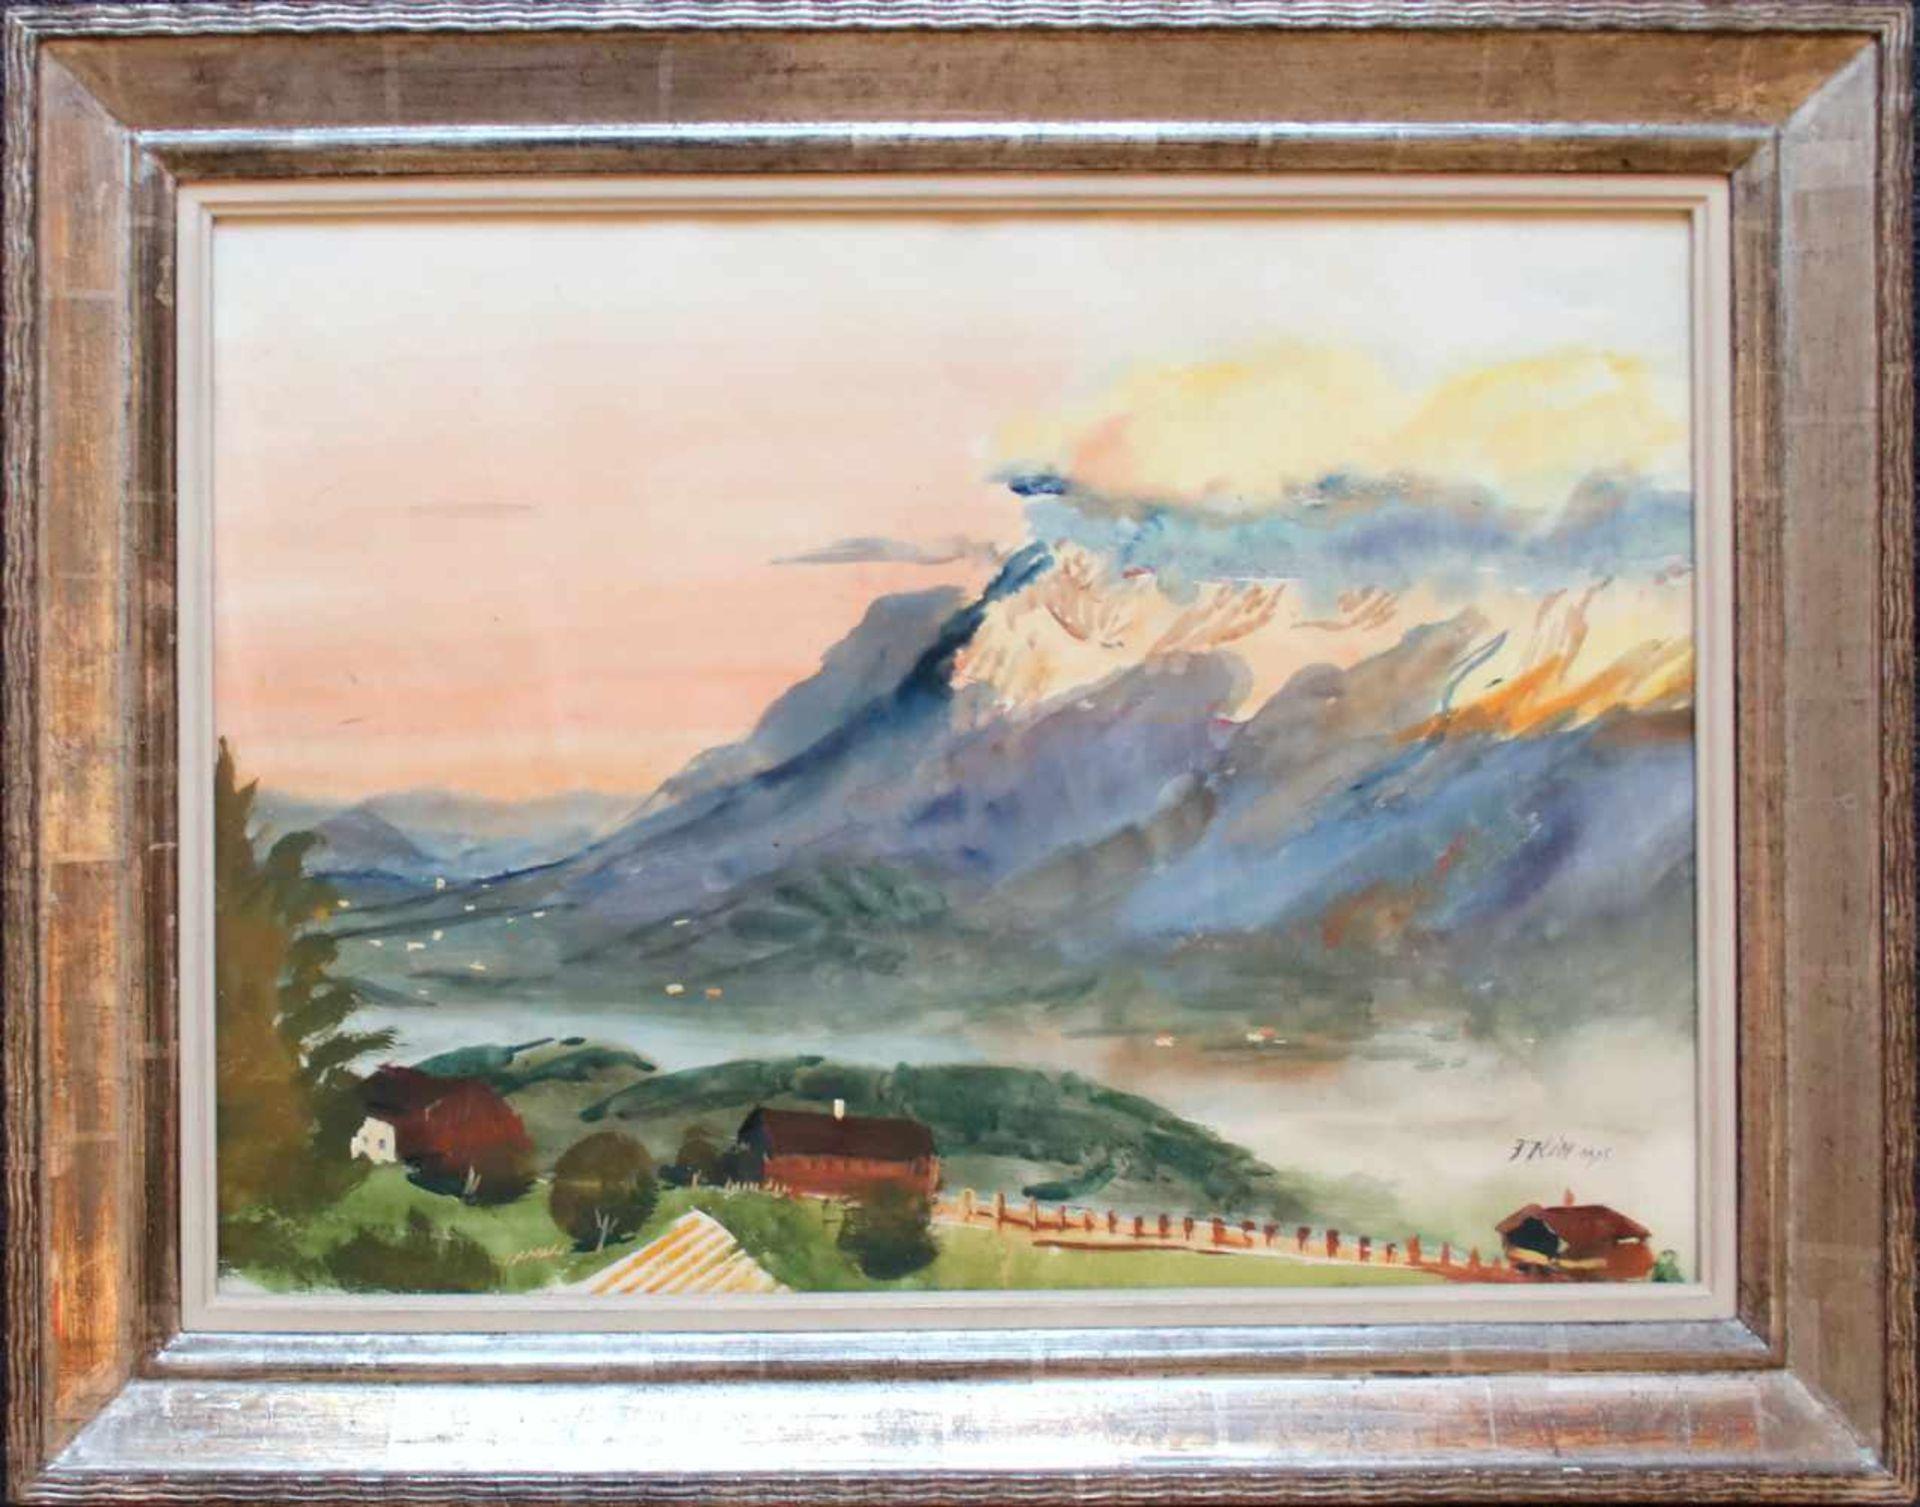 Ferdinand Kitt (1887 - 1961) Im Salzkammergut 1925 Aquarell auf Papier Signiert und datiert 37,5 x